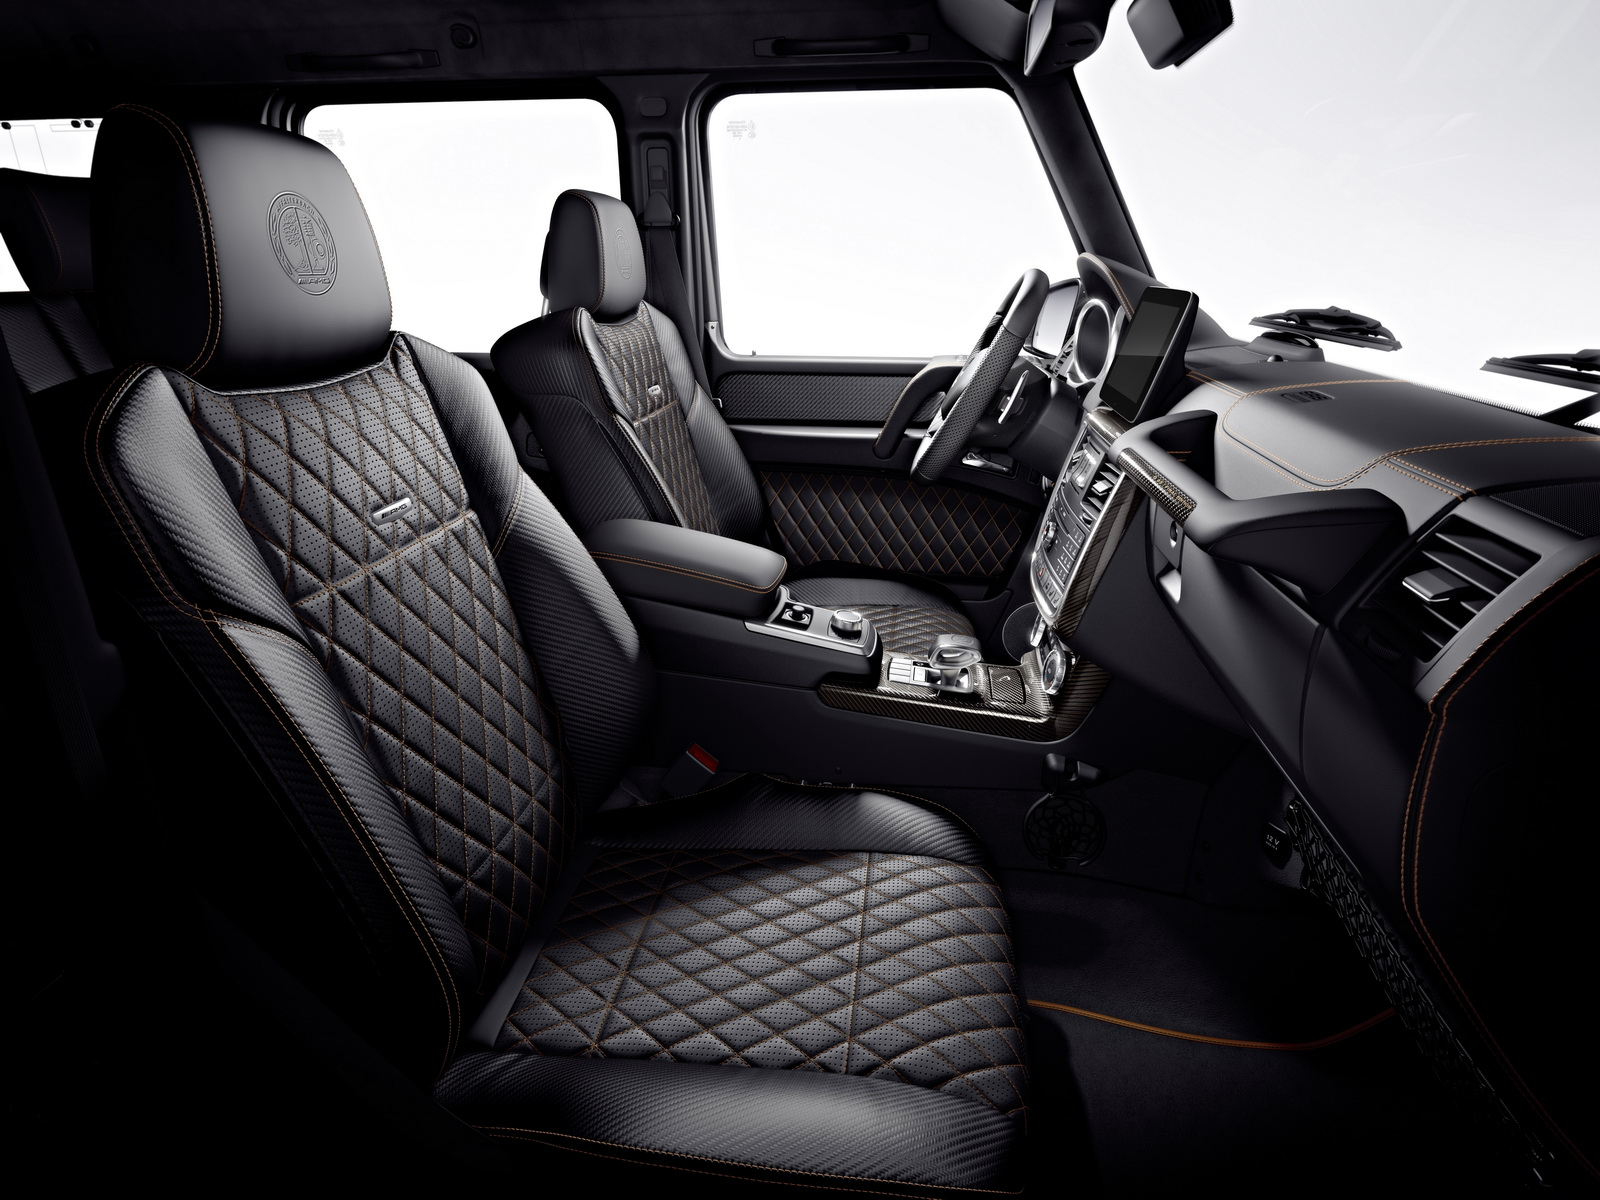 2017 mercedes amg-g65 final edition